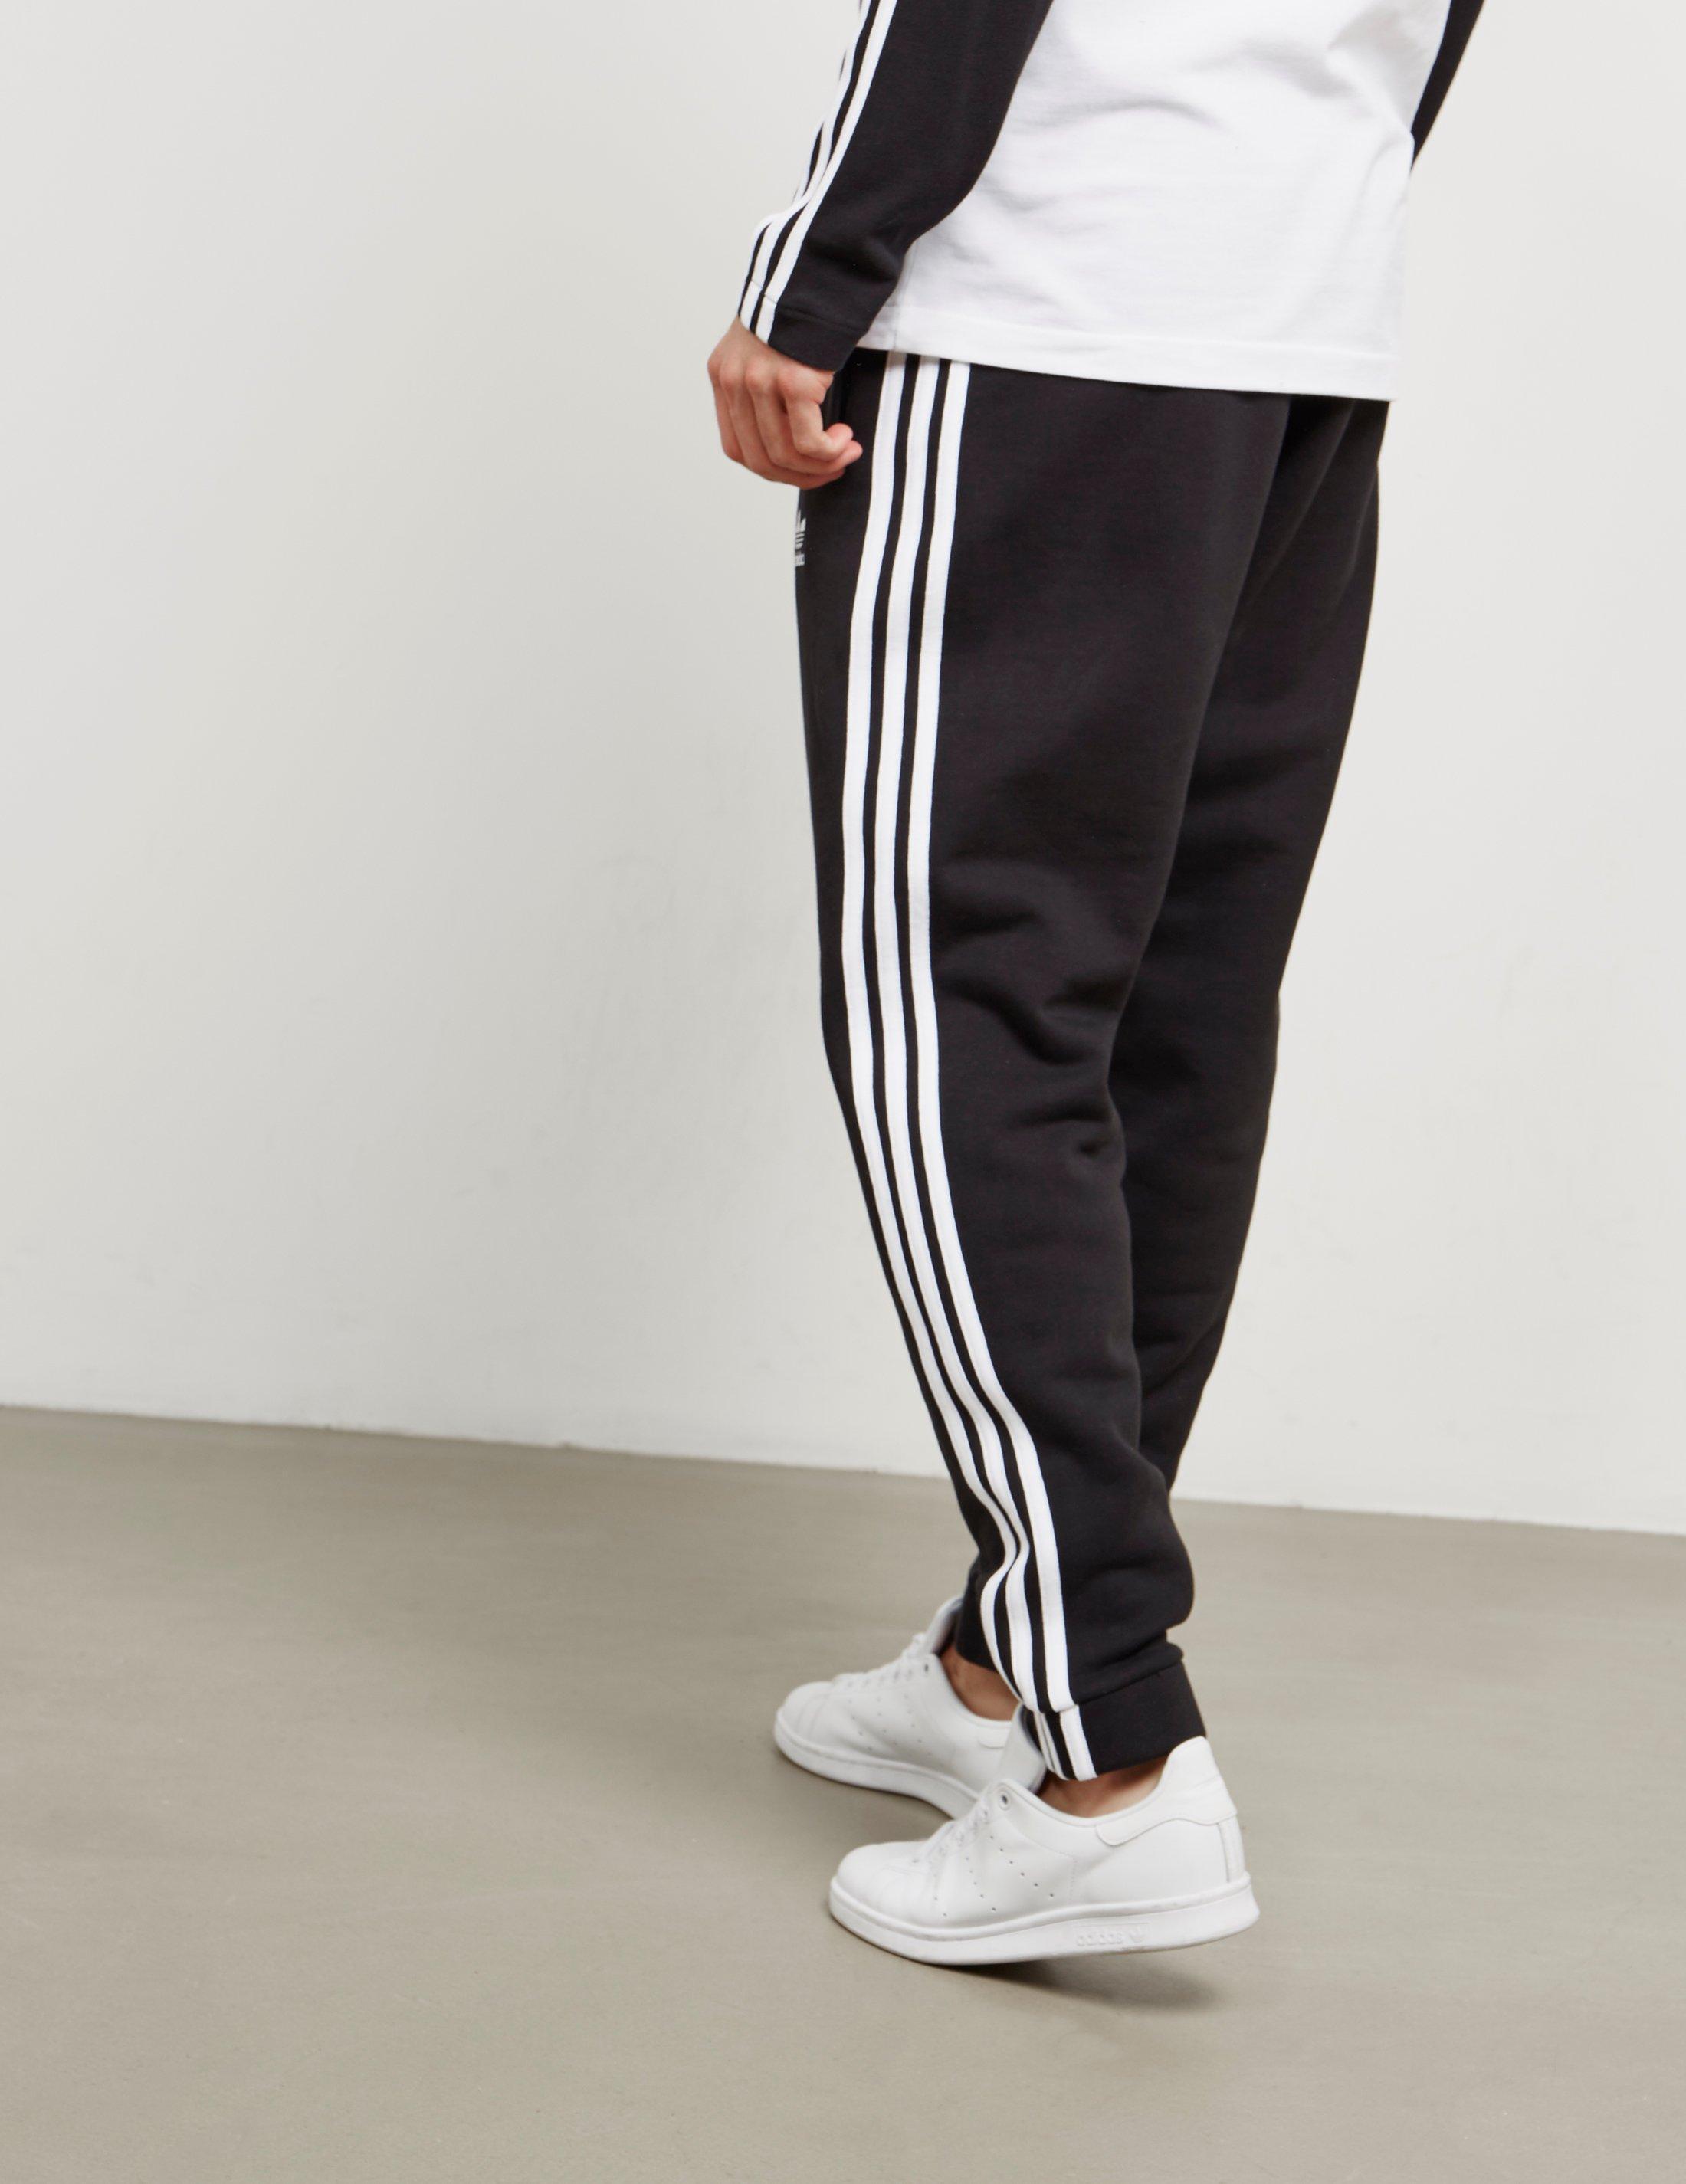 e660633283e02 adidas-originals-Black-Mens-Trefoil-Fleece-Track-Pants-Black.jpeg